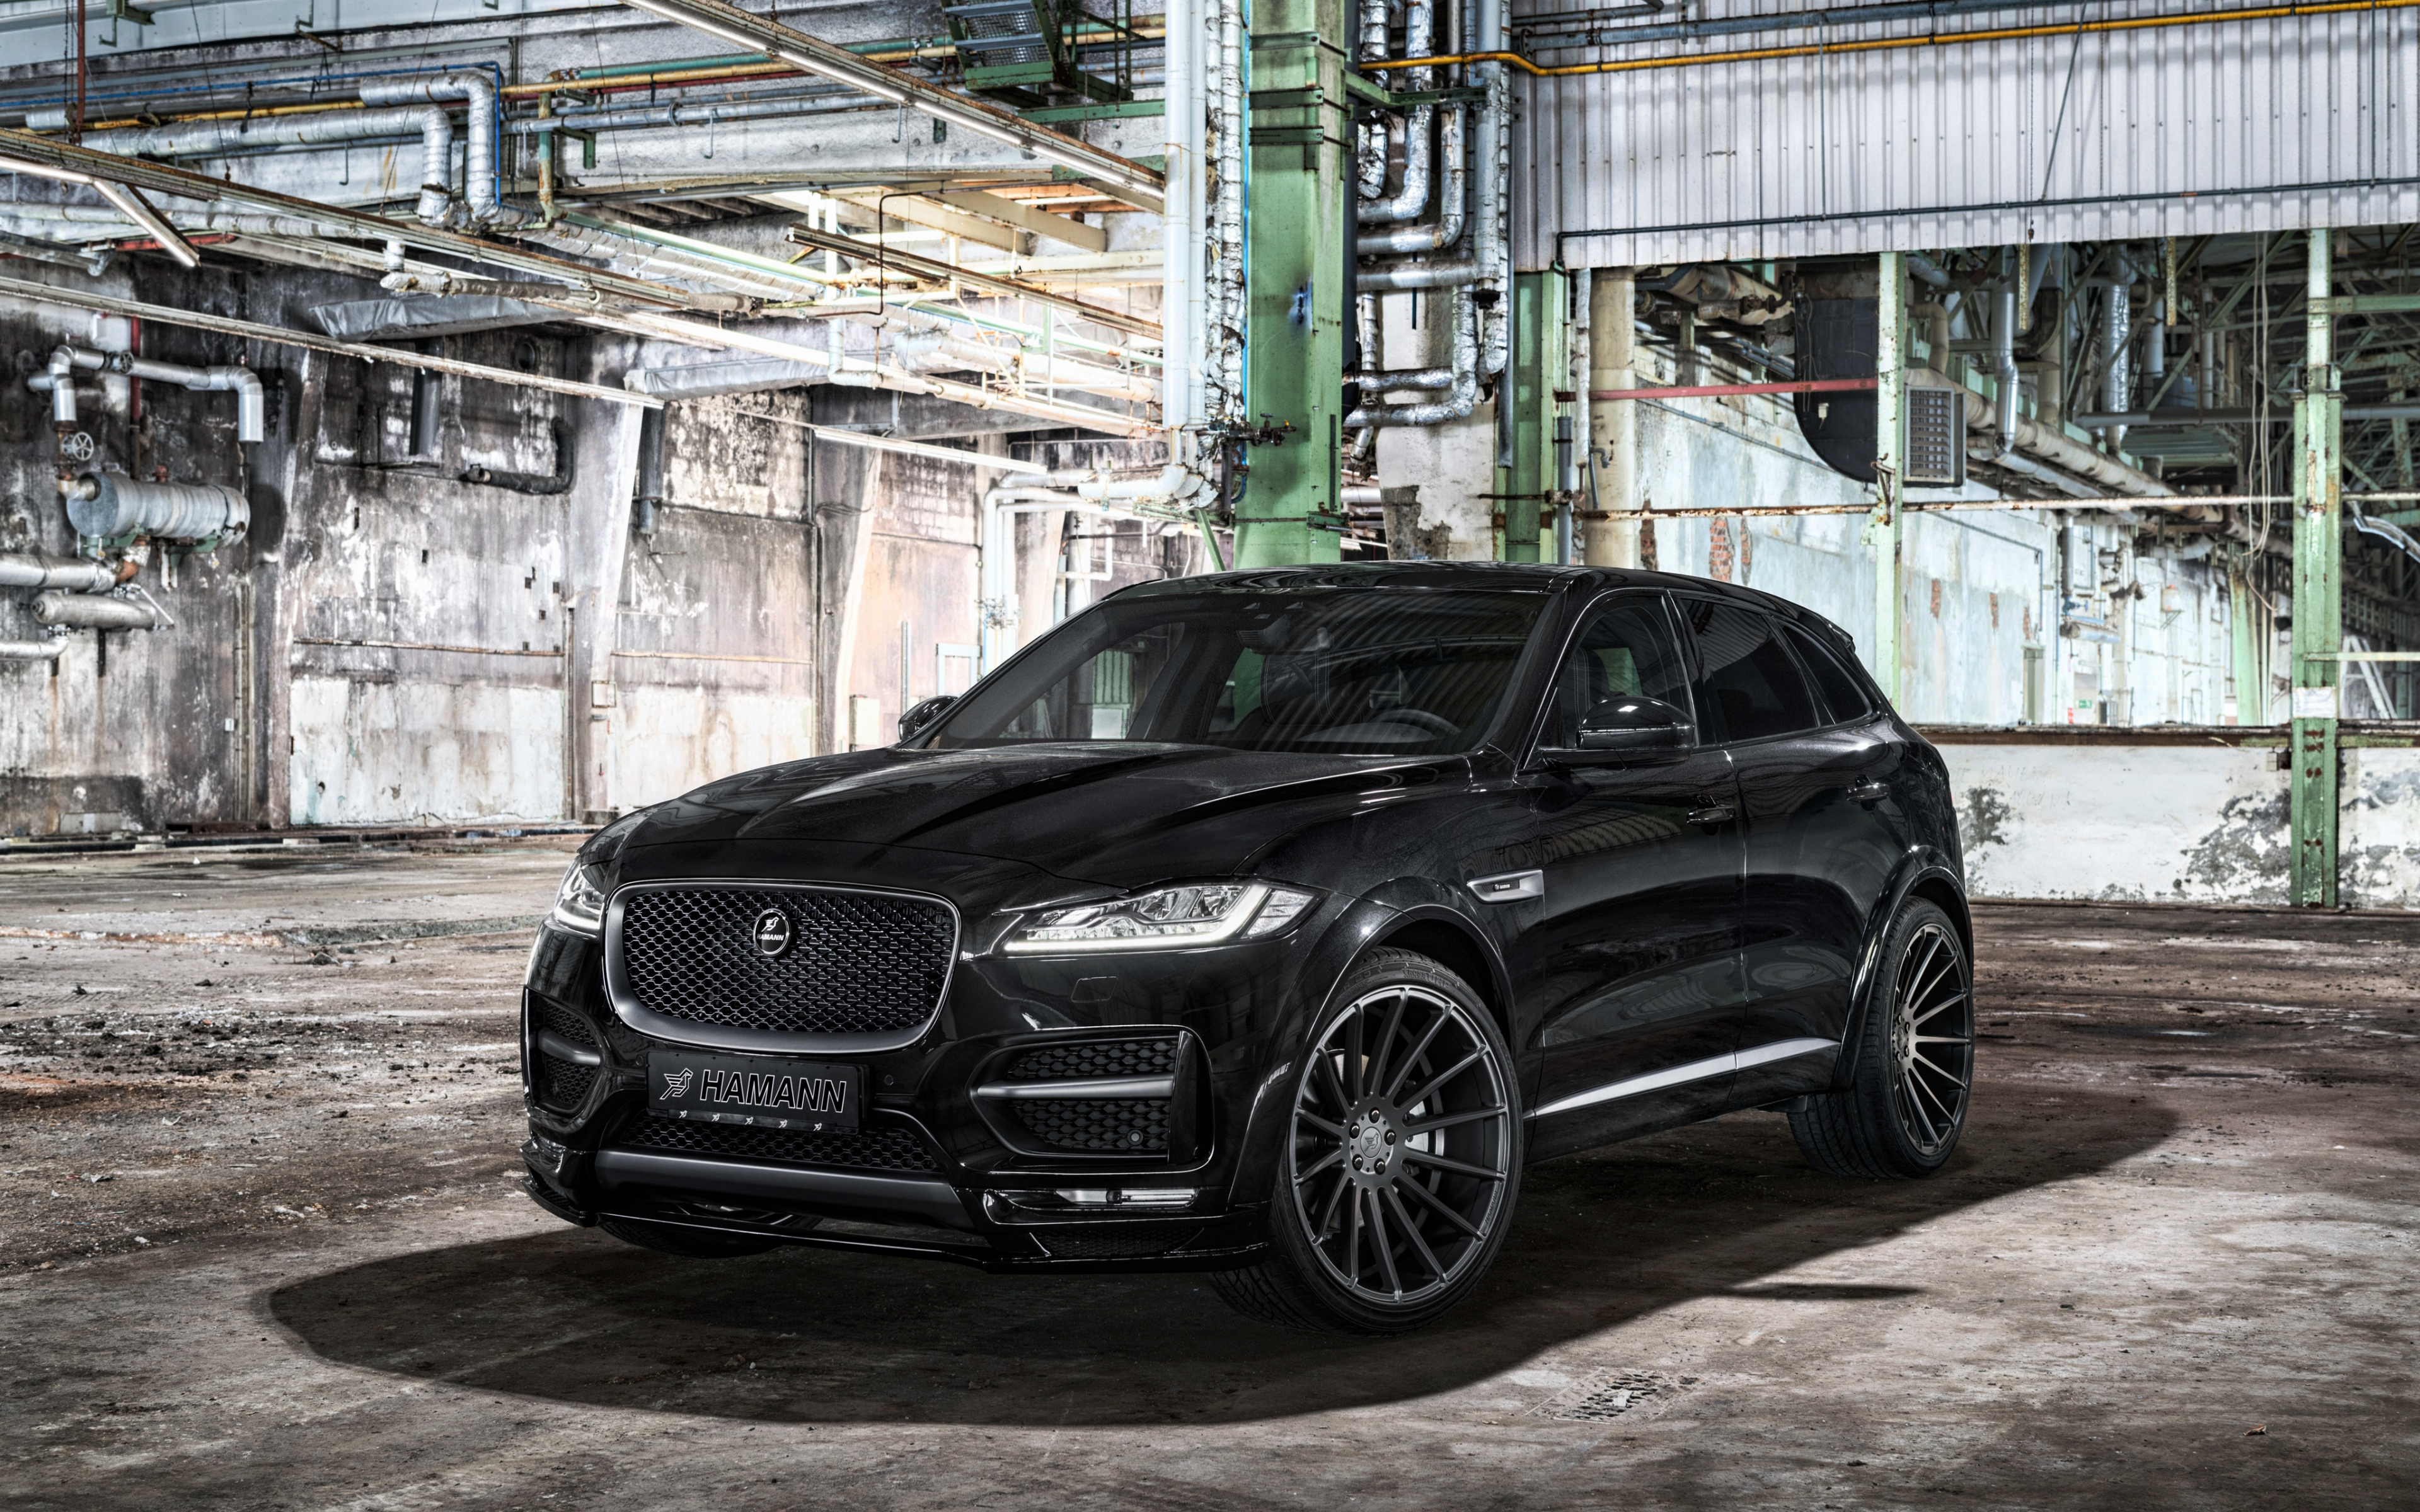 Download 3840x2400 Wallpaper 2017 Jaguar F Pace Black Luxury Car 4